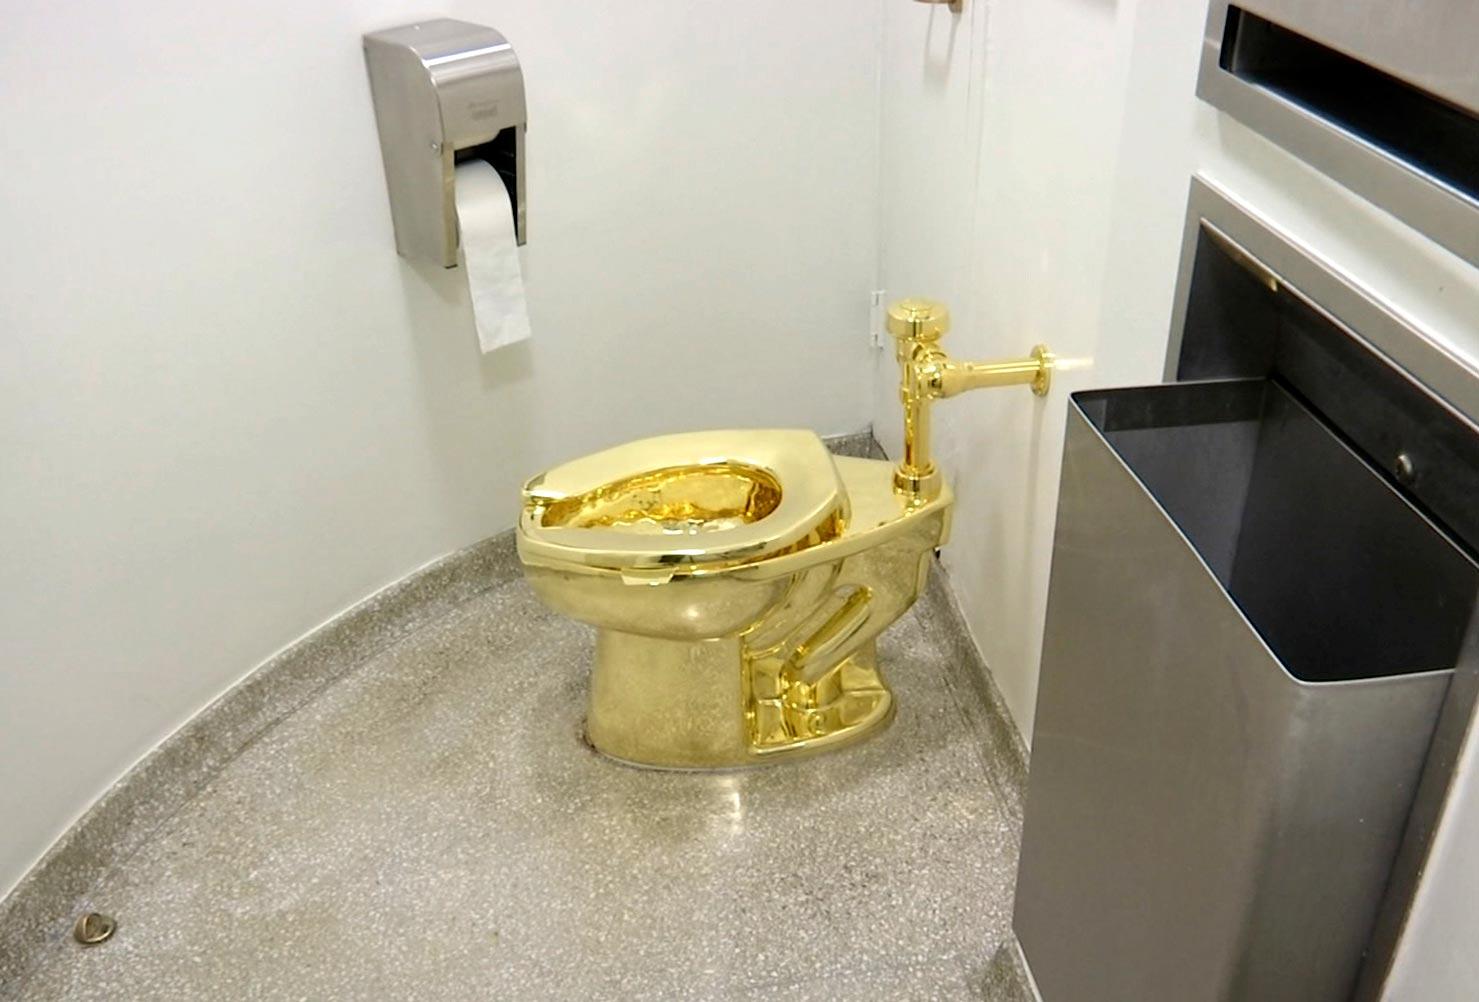 guggenheim museum new york toilet,weird story ,अजब गजब खबरे,टॉयलेट, न्यूयॉर्क